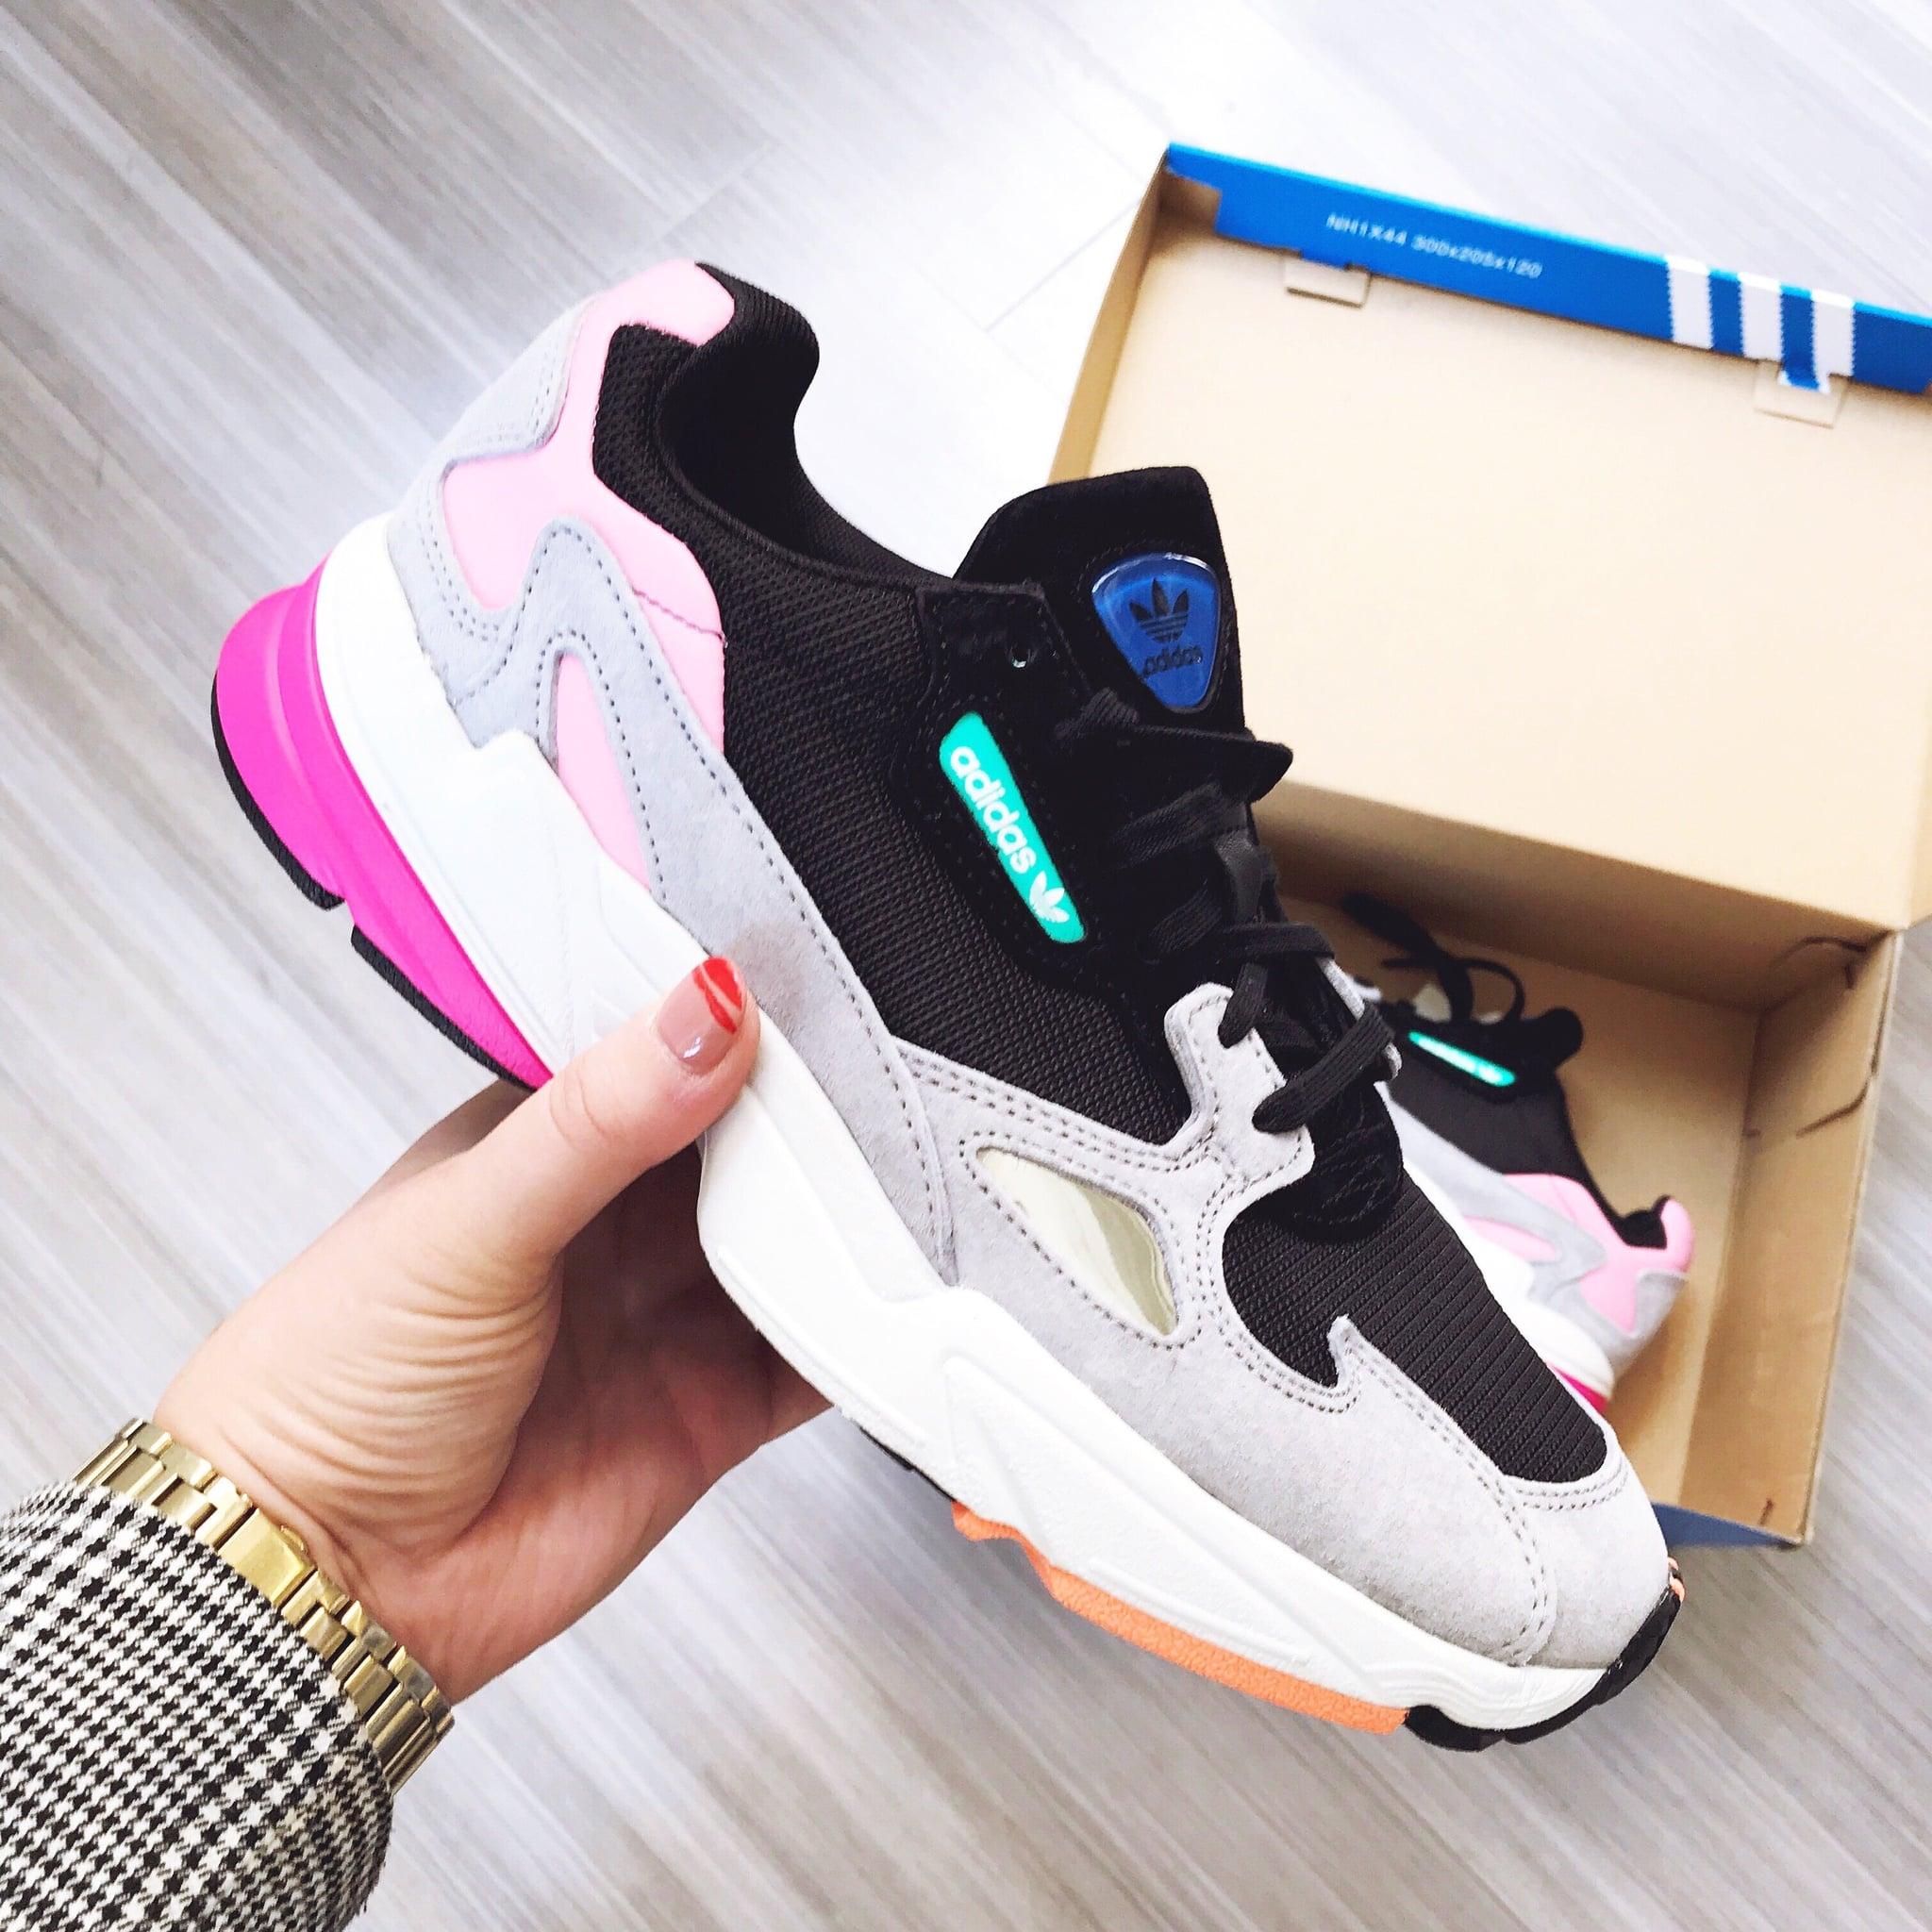 Adidas Falcon Sneaker Review | POPSUGAR